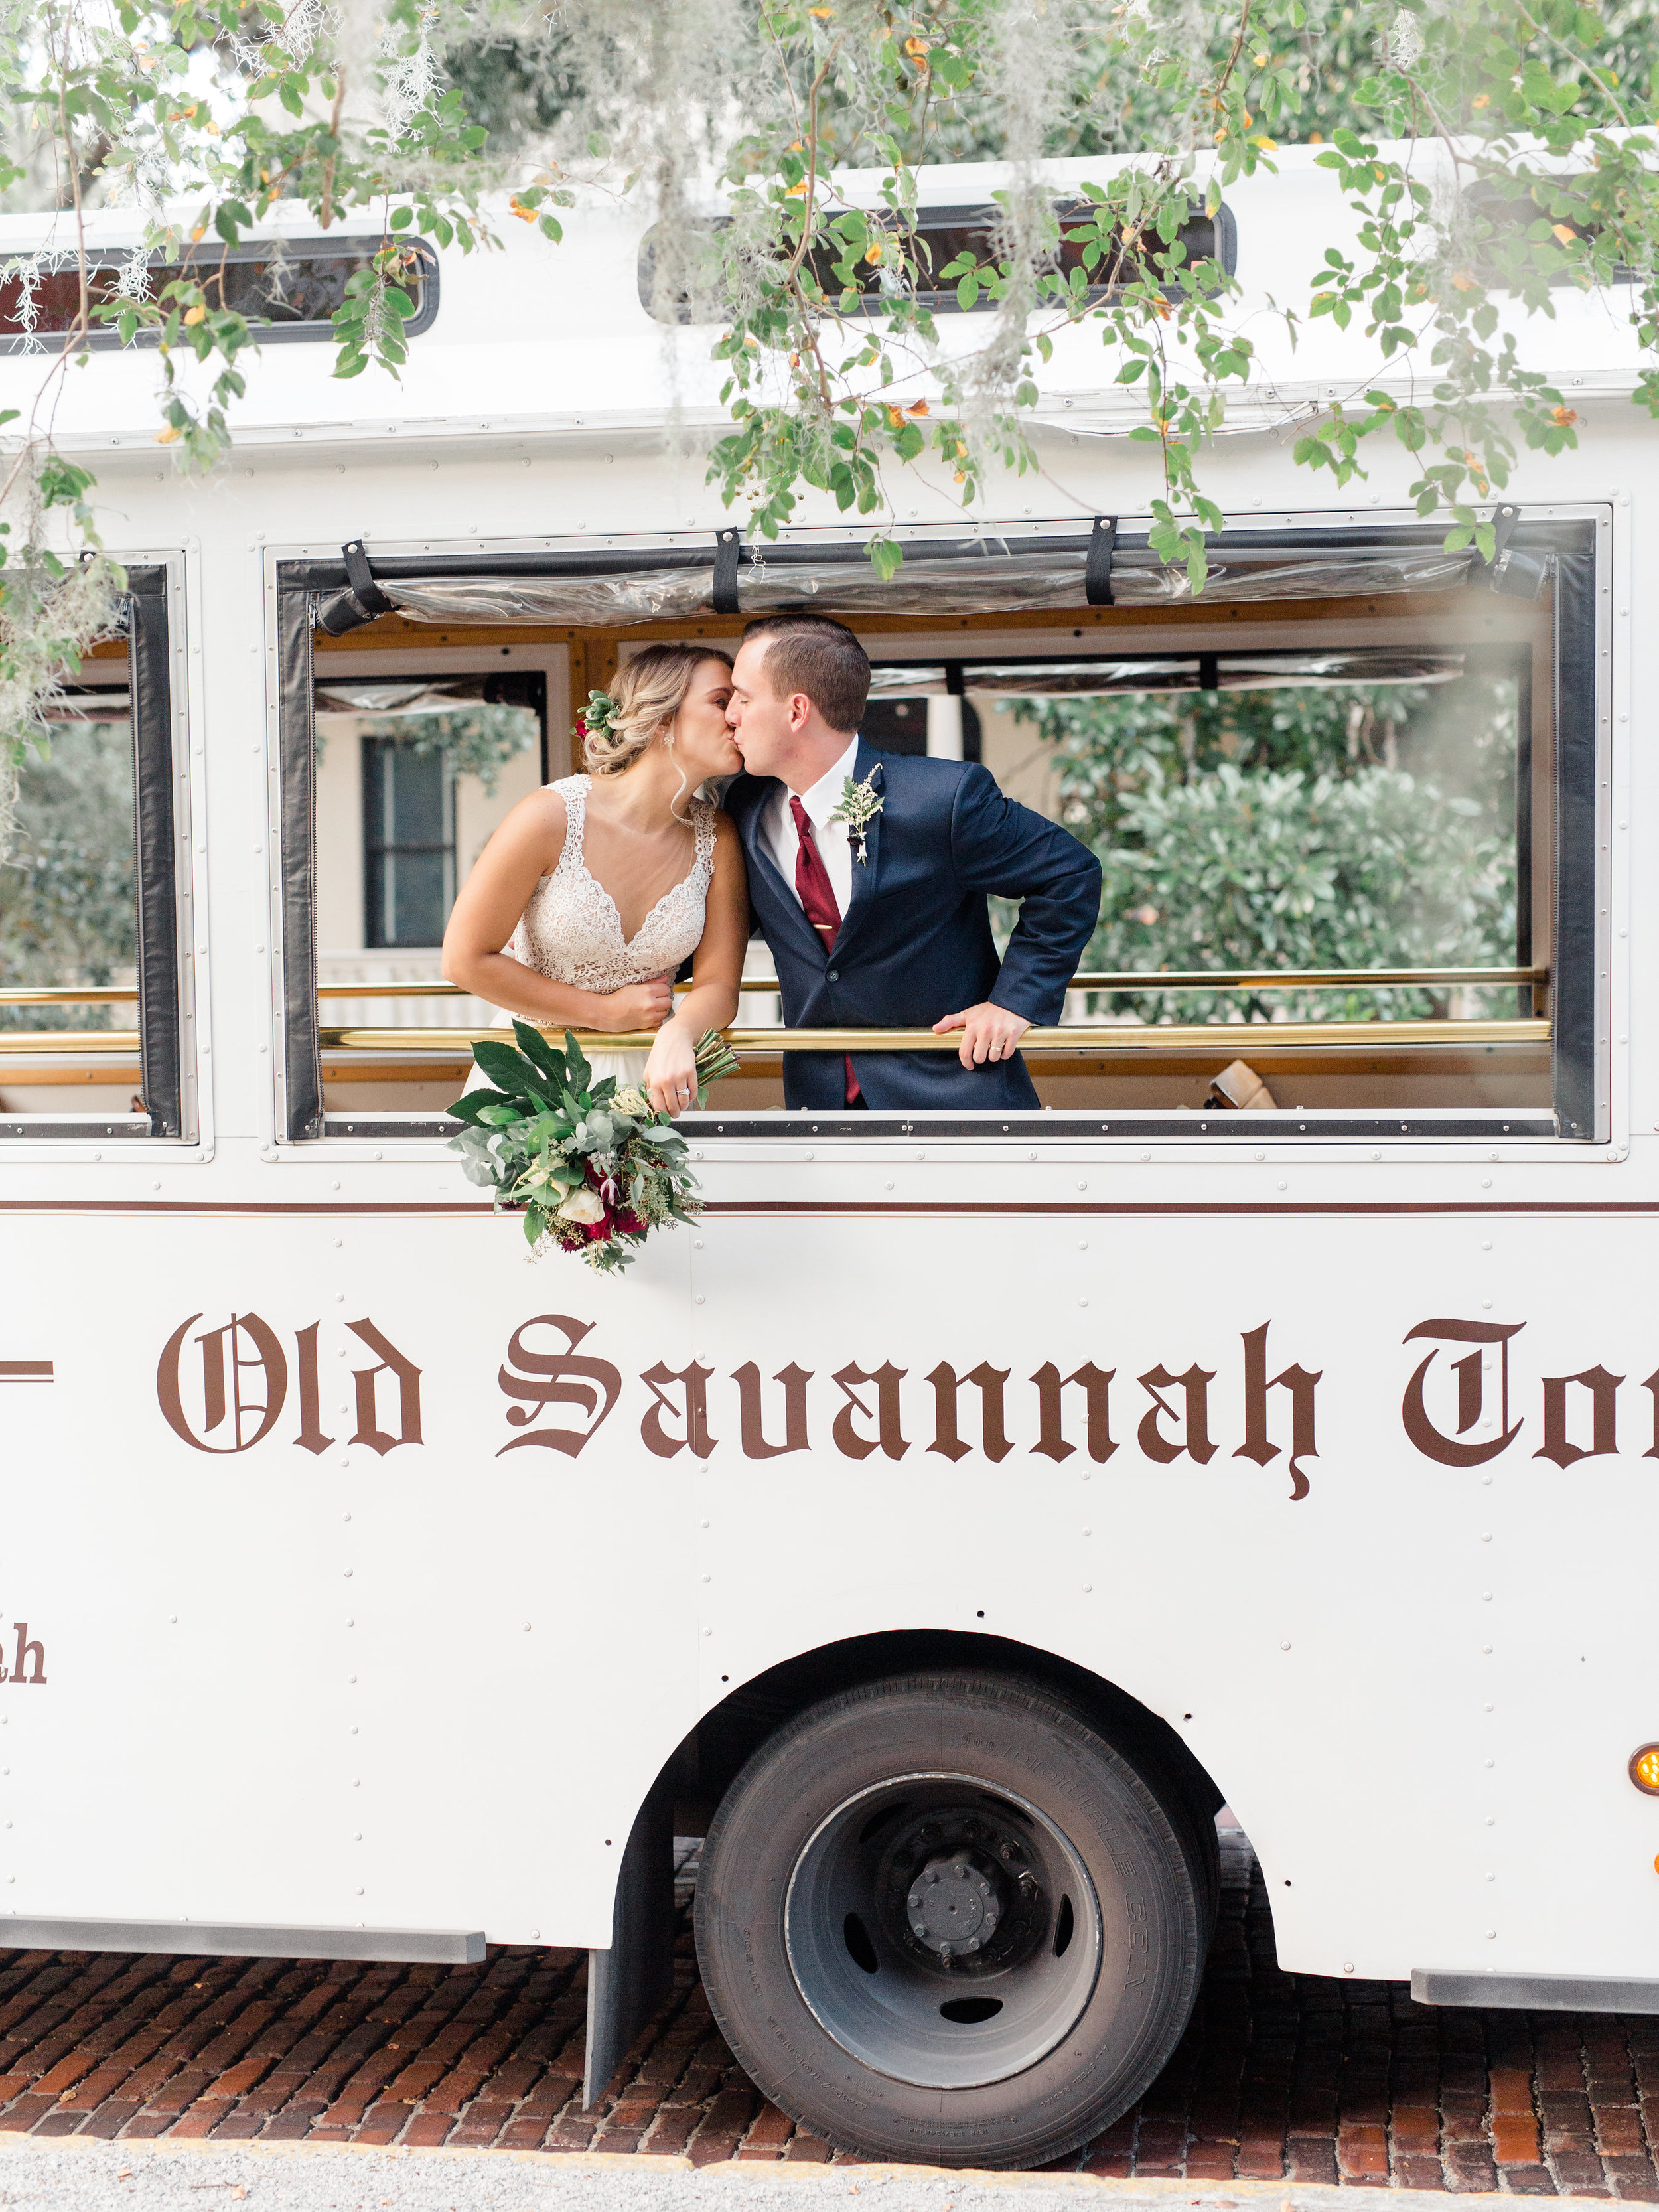 savannah-wedding-ideas-savannah-wedding-savannah-bride-savannah-wedding-dress-savannah-couple-savannah-tours-savannah-wedding-kiss-trolley-ride